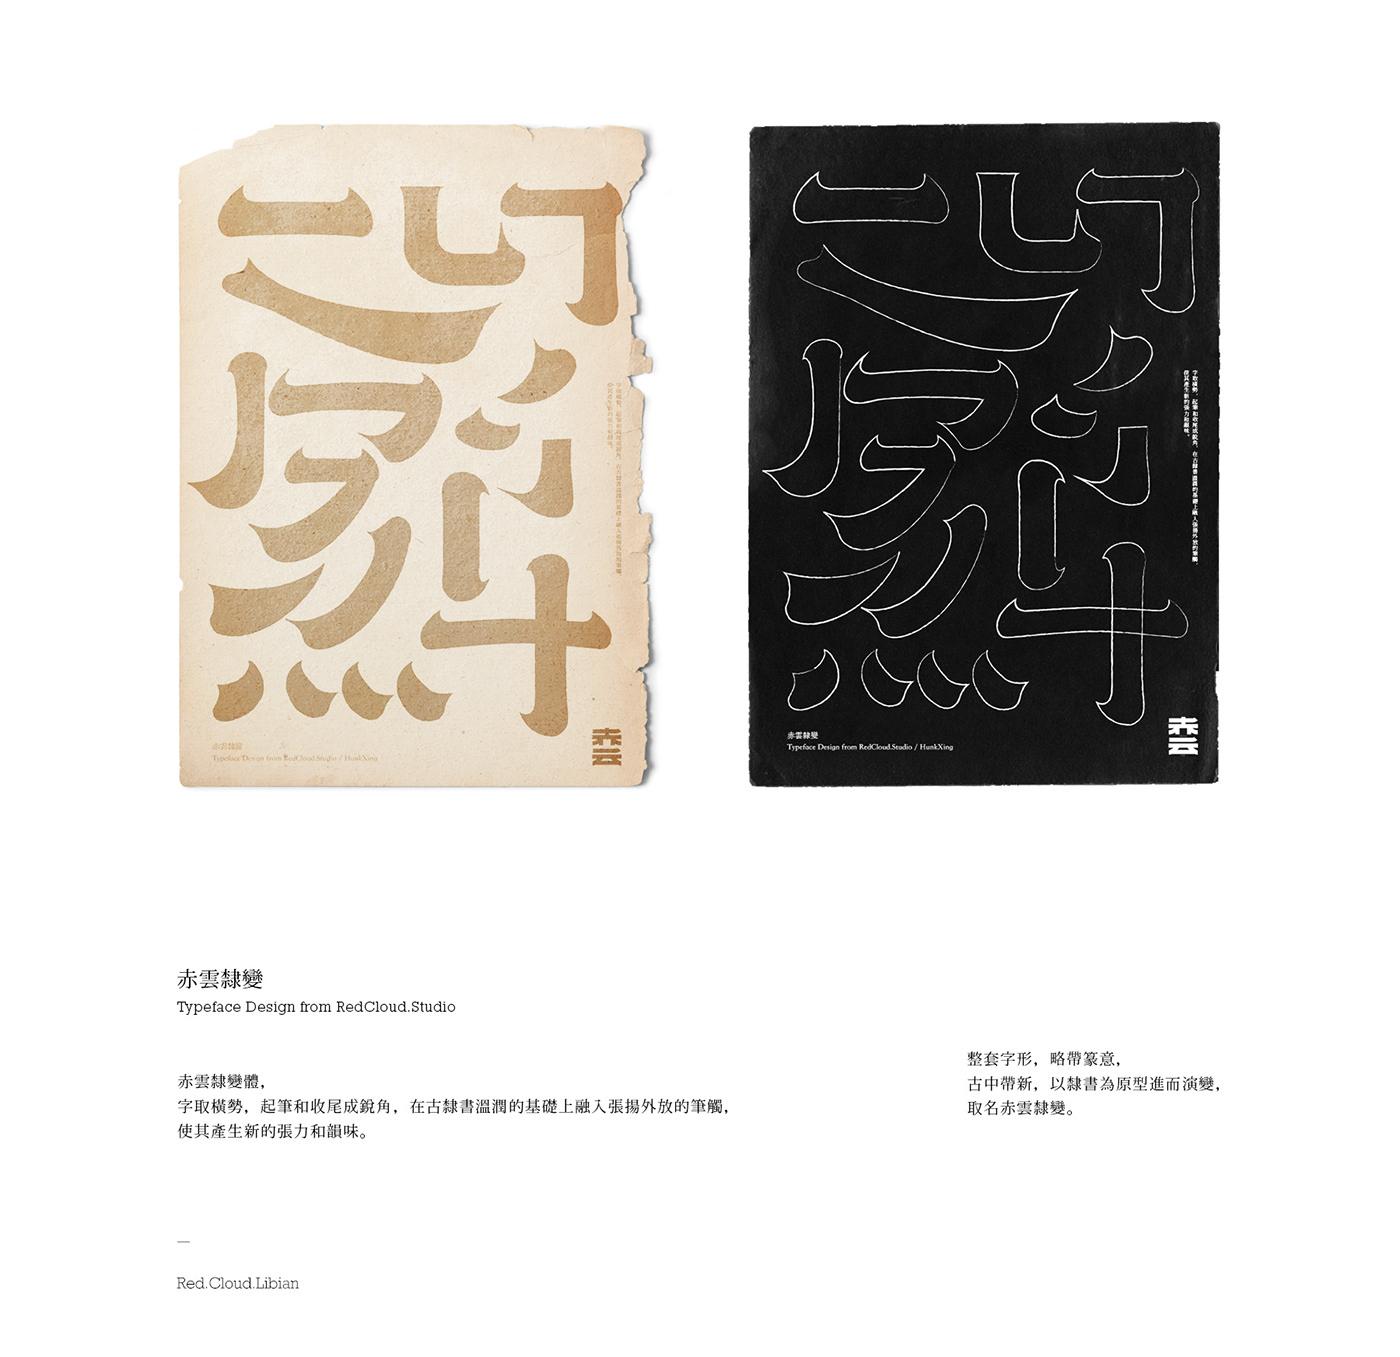 字体设计 字库 Typeface fonts